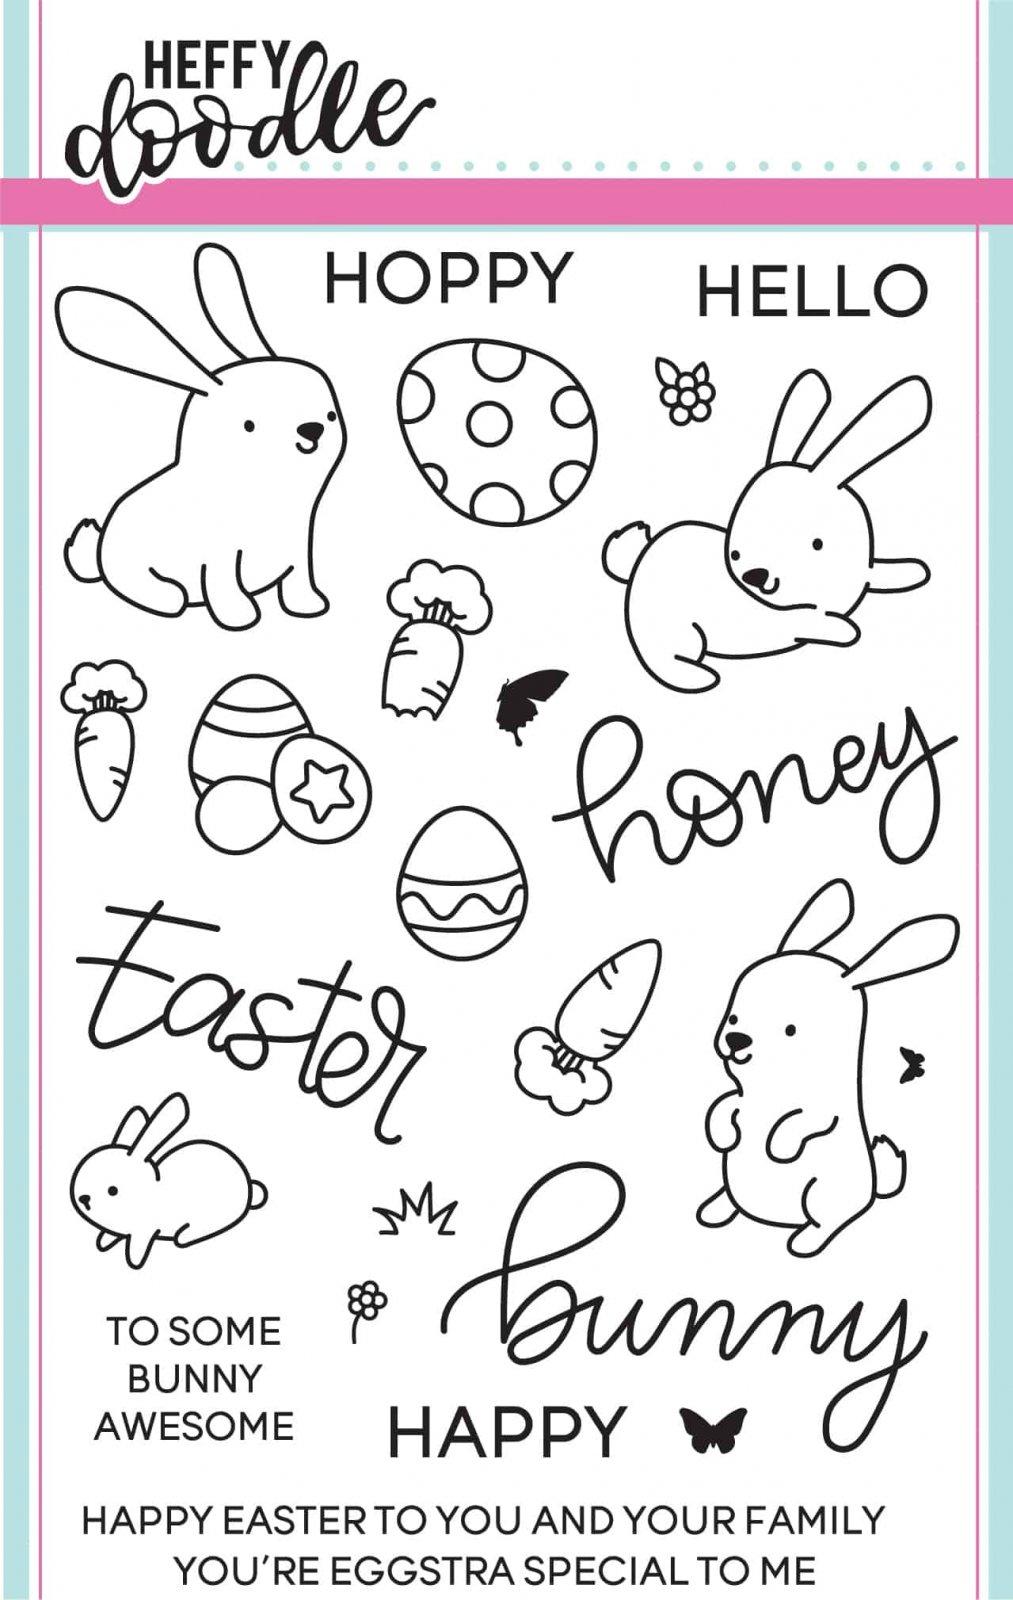 Heffy Doodle - Honey Bunny Boo Stamp and Die Combo Set